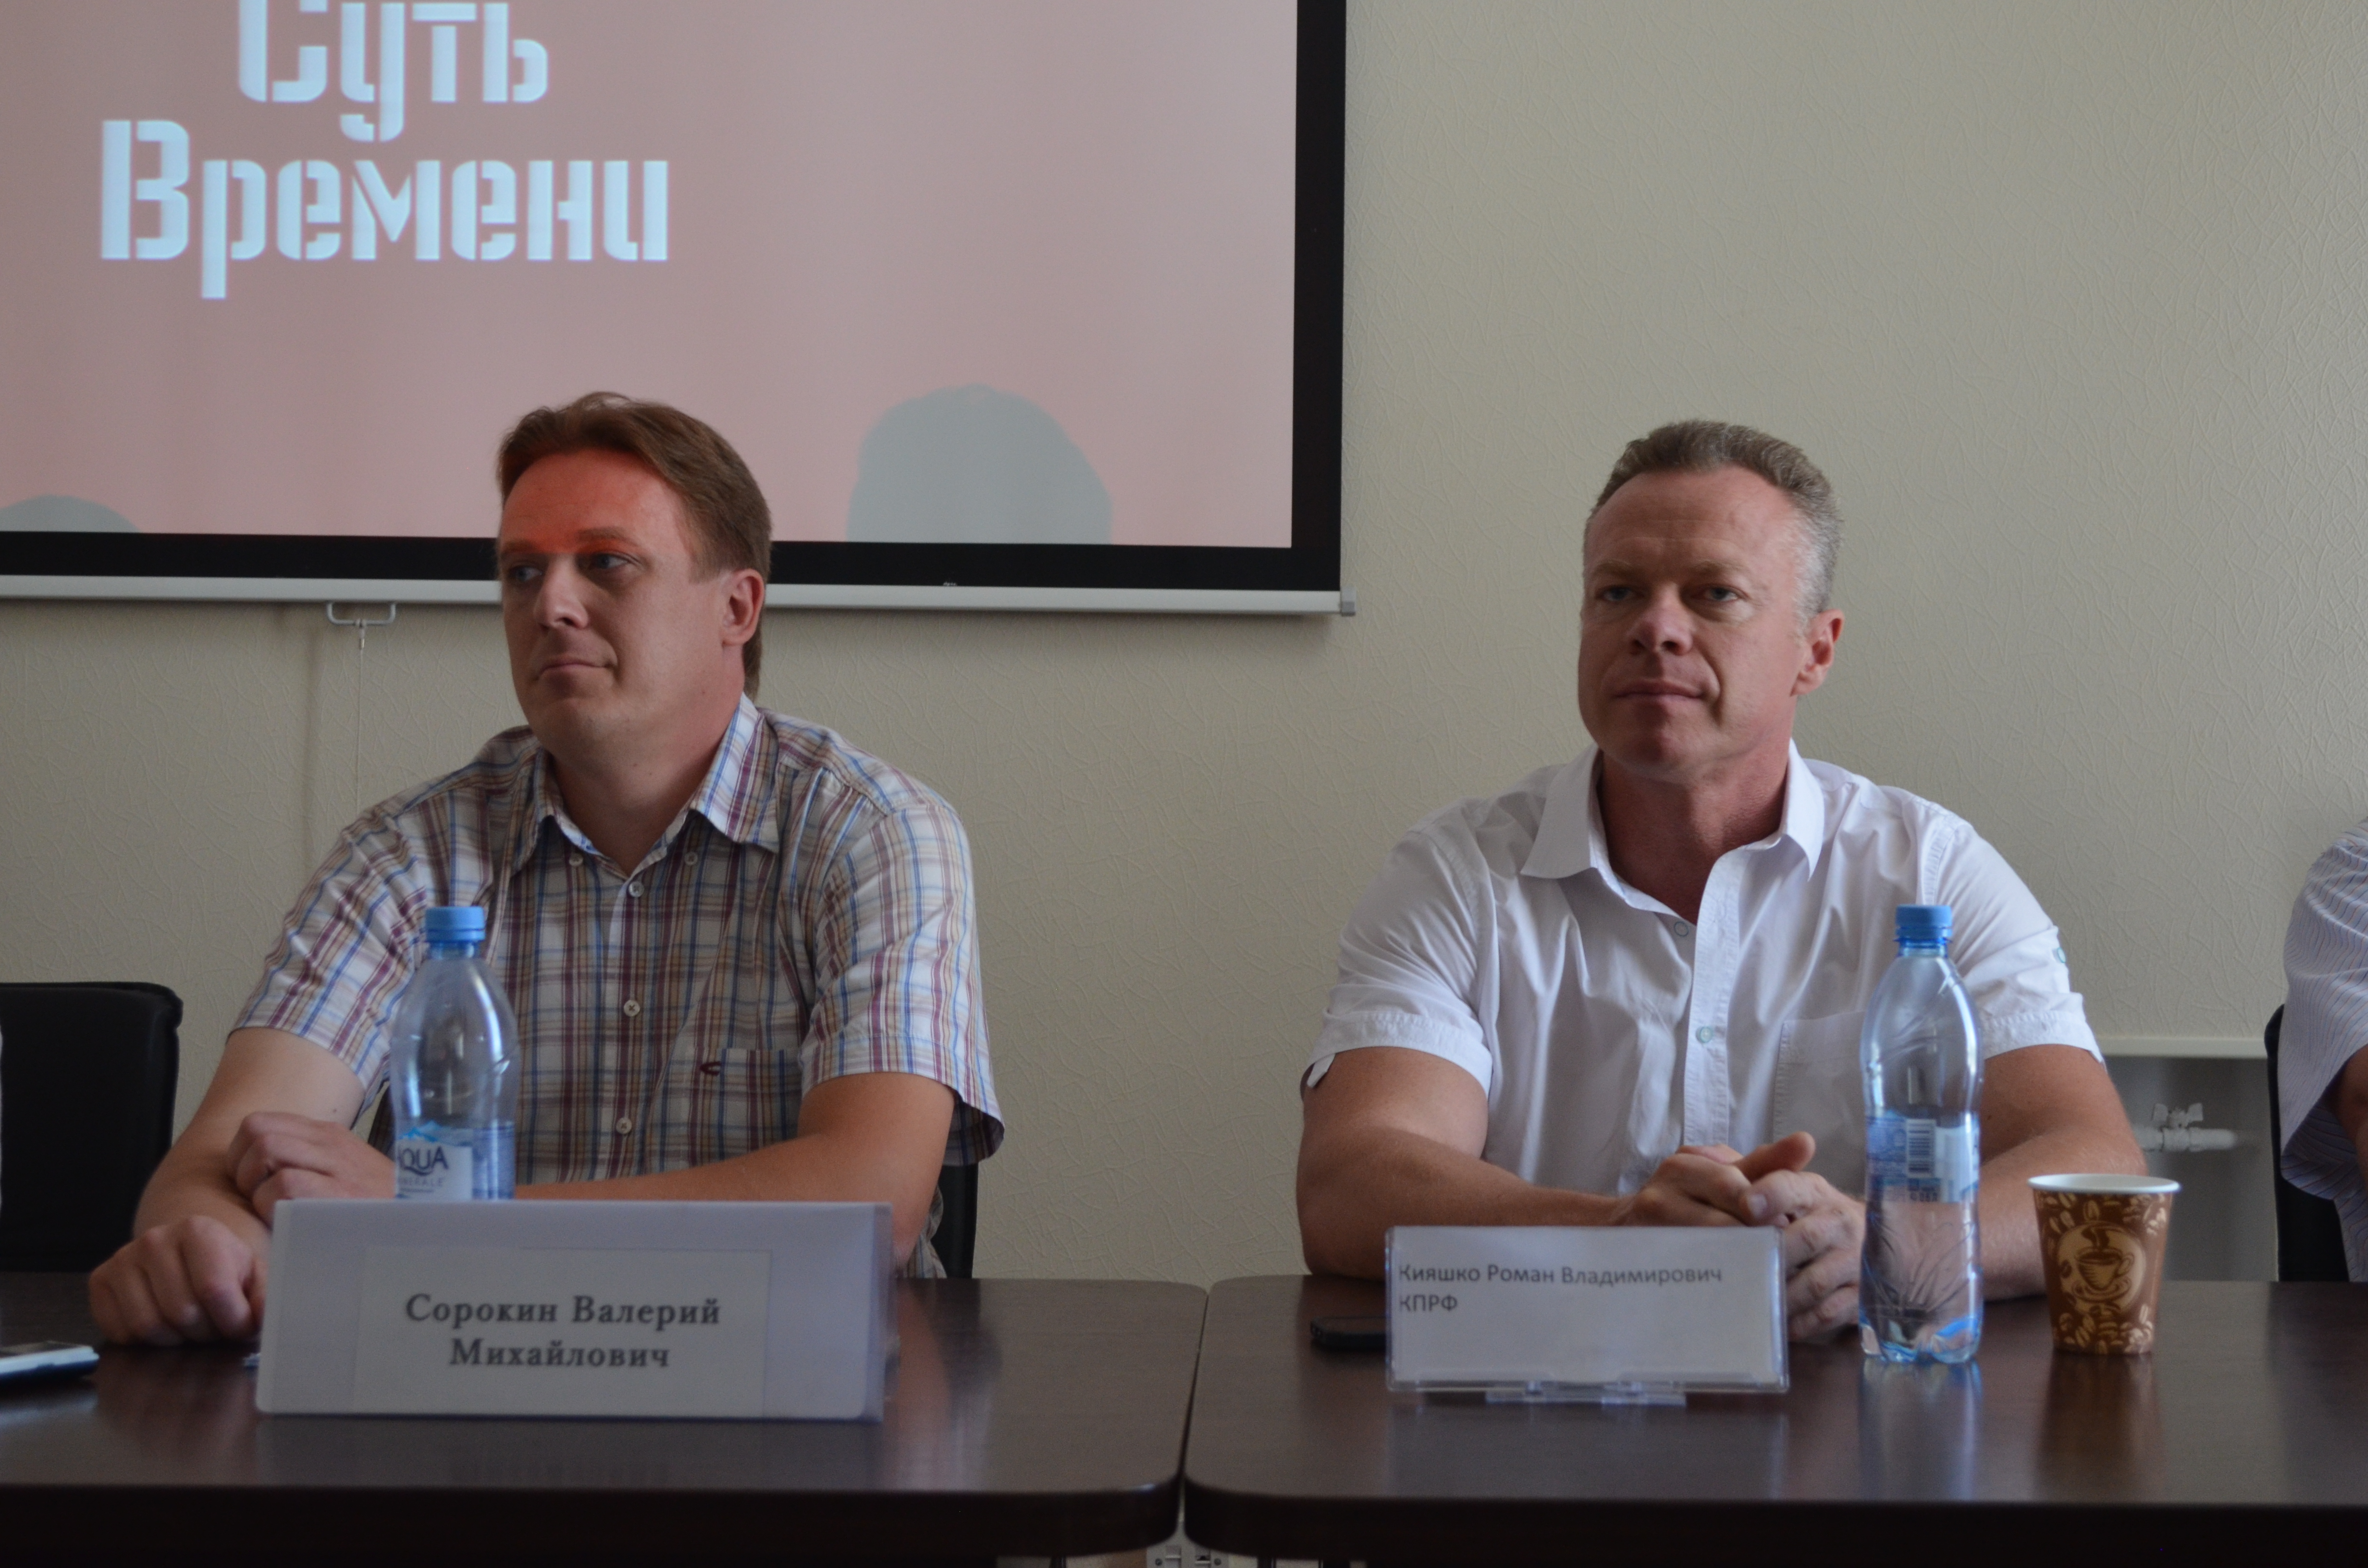 20170714-В Севастополе прошла пресс-конференция «Лики примирения»-pic2